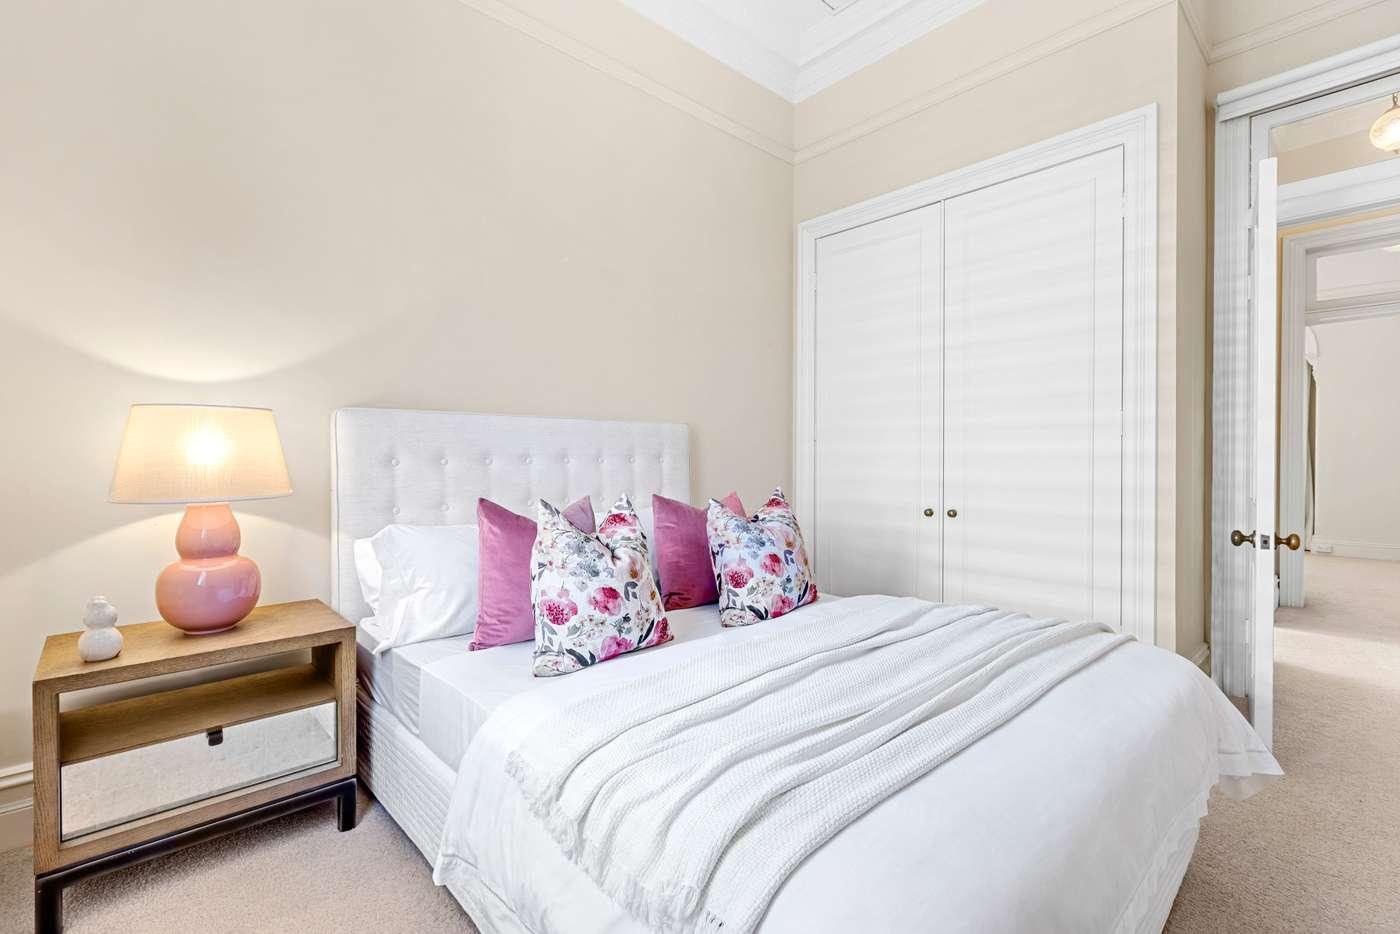 Sixth view of Homely apartment listing, 1/145 Raglan Street, Mosman NSW 2088